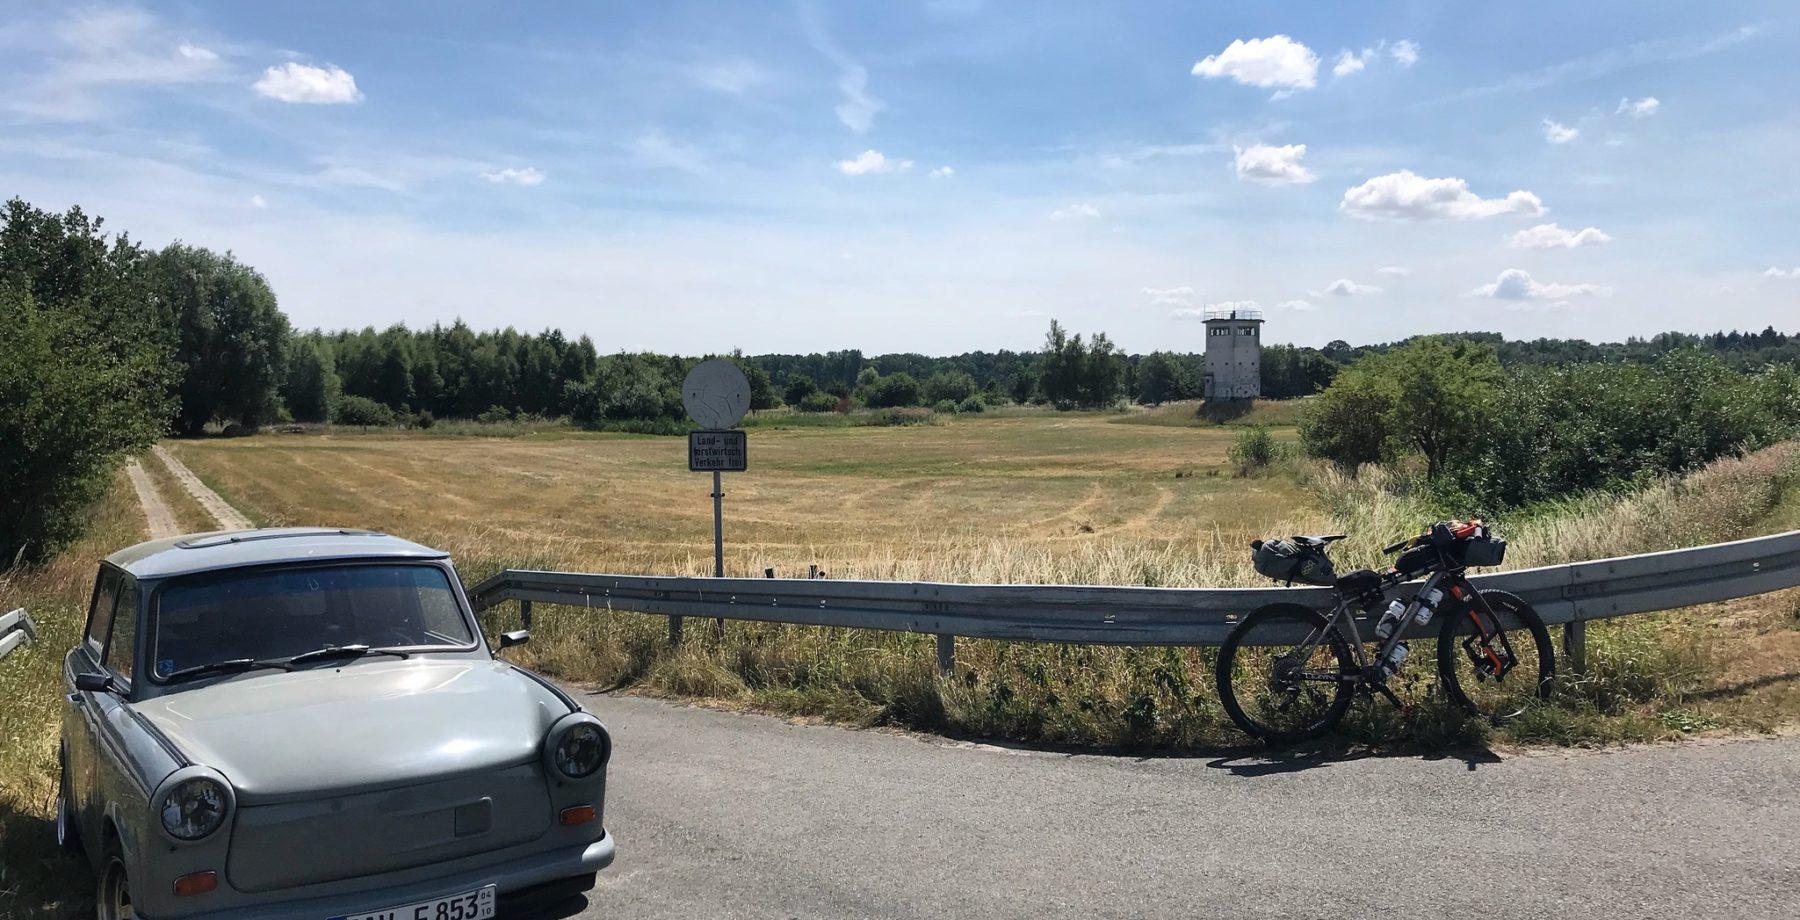 Grenzsteintrophy - bikes, trabants and watchtowers